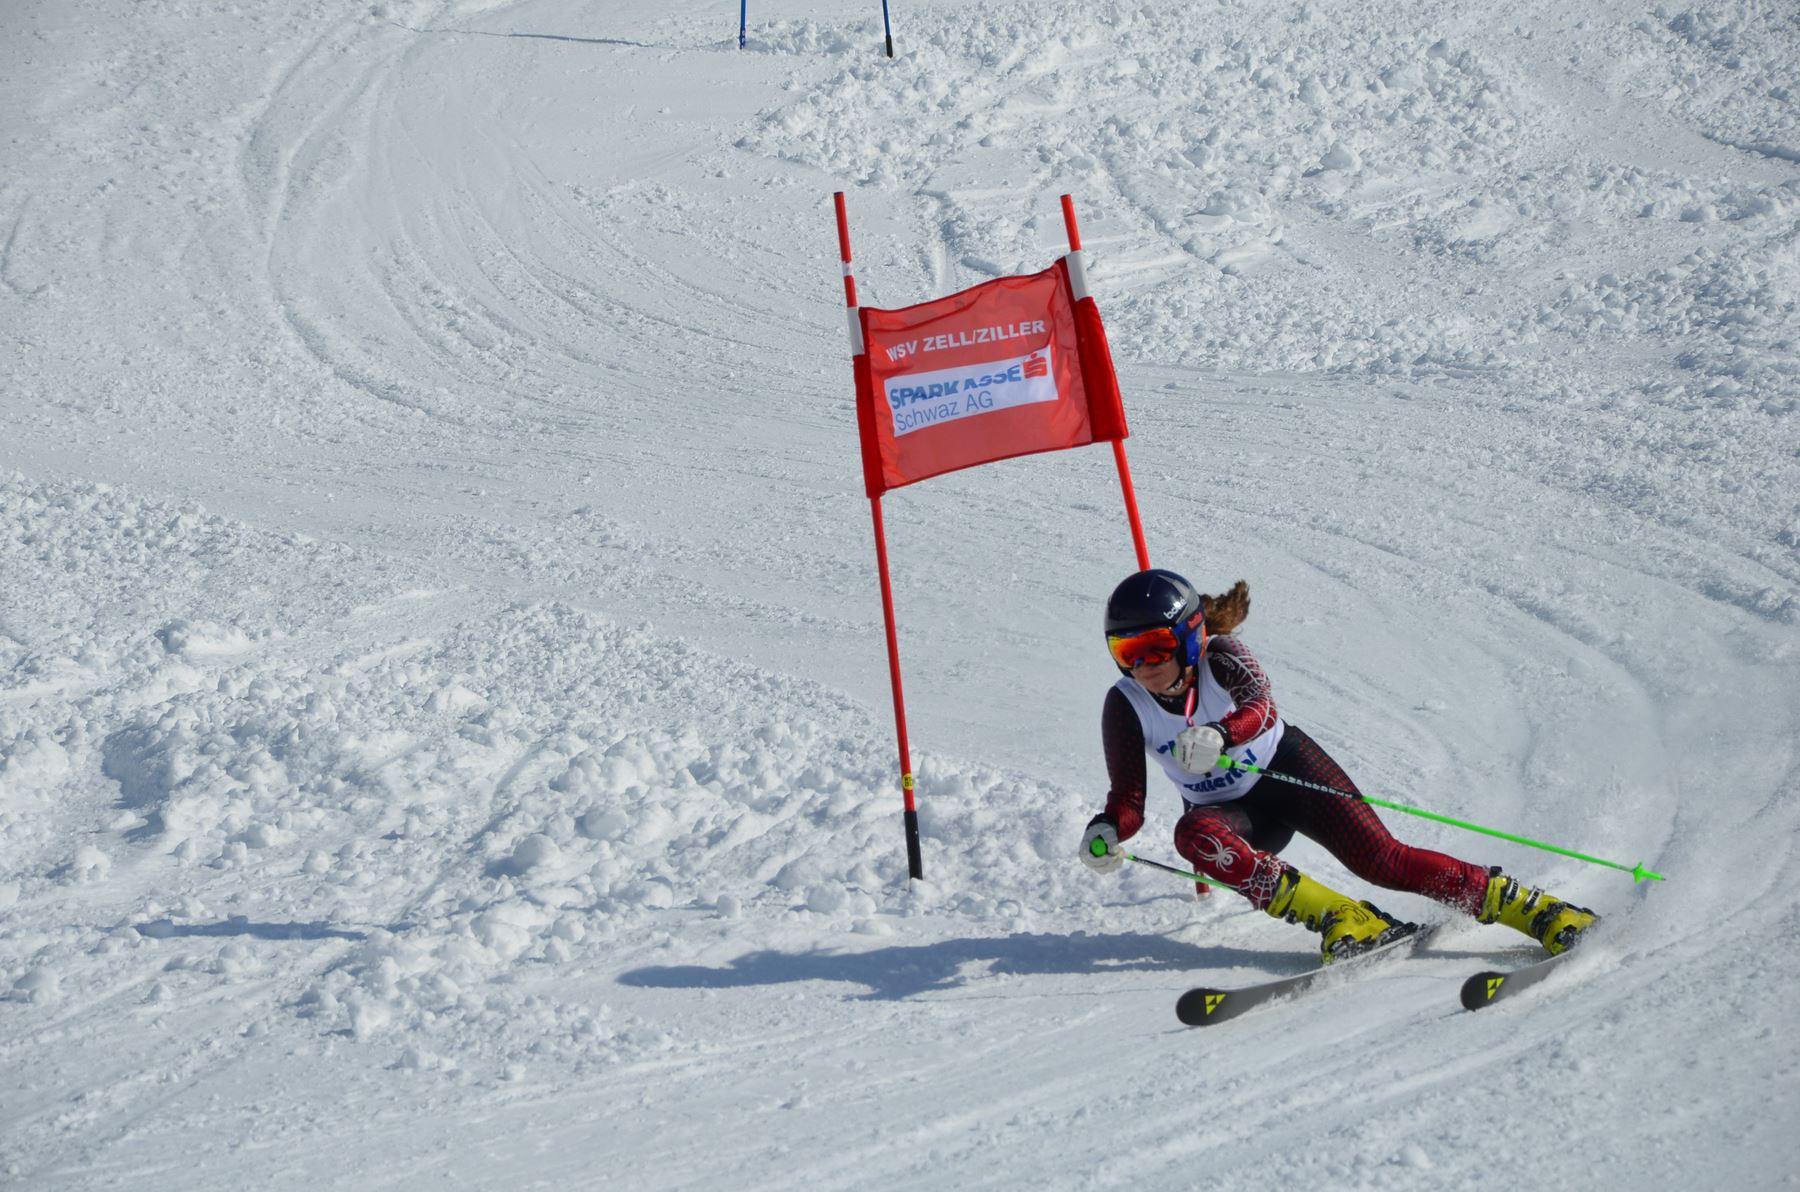 2015-03-22 BV Zillertal Skirennen 154.JPG